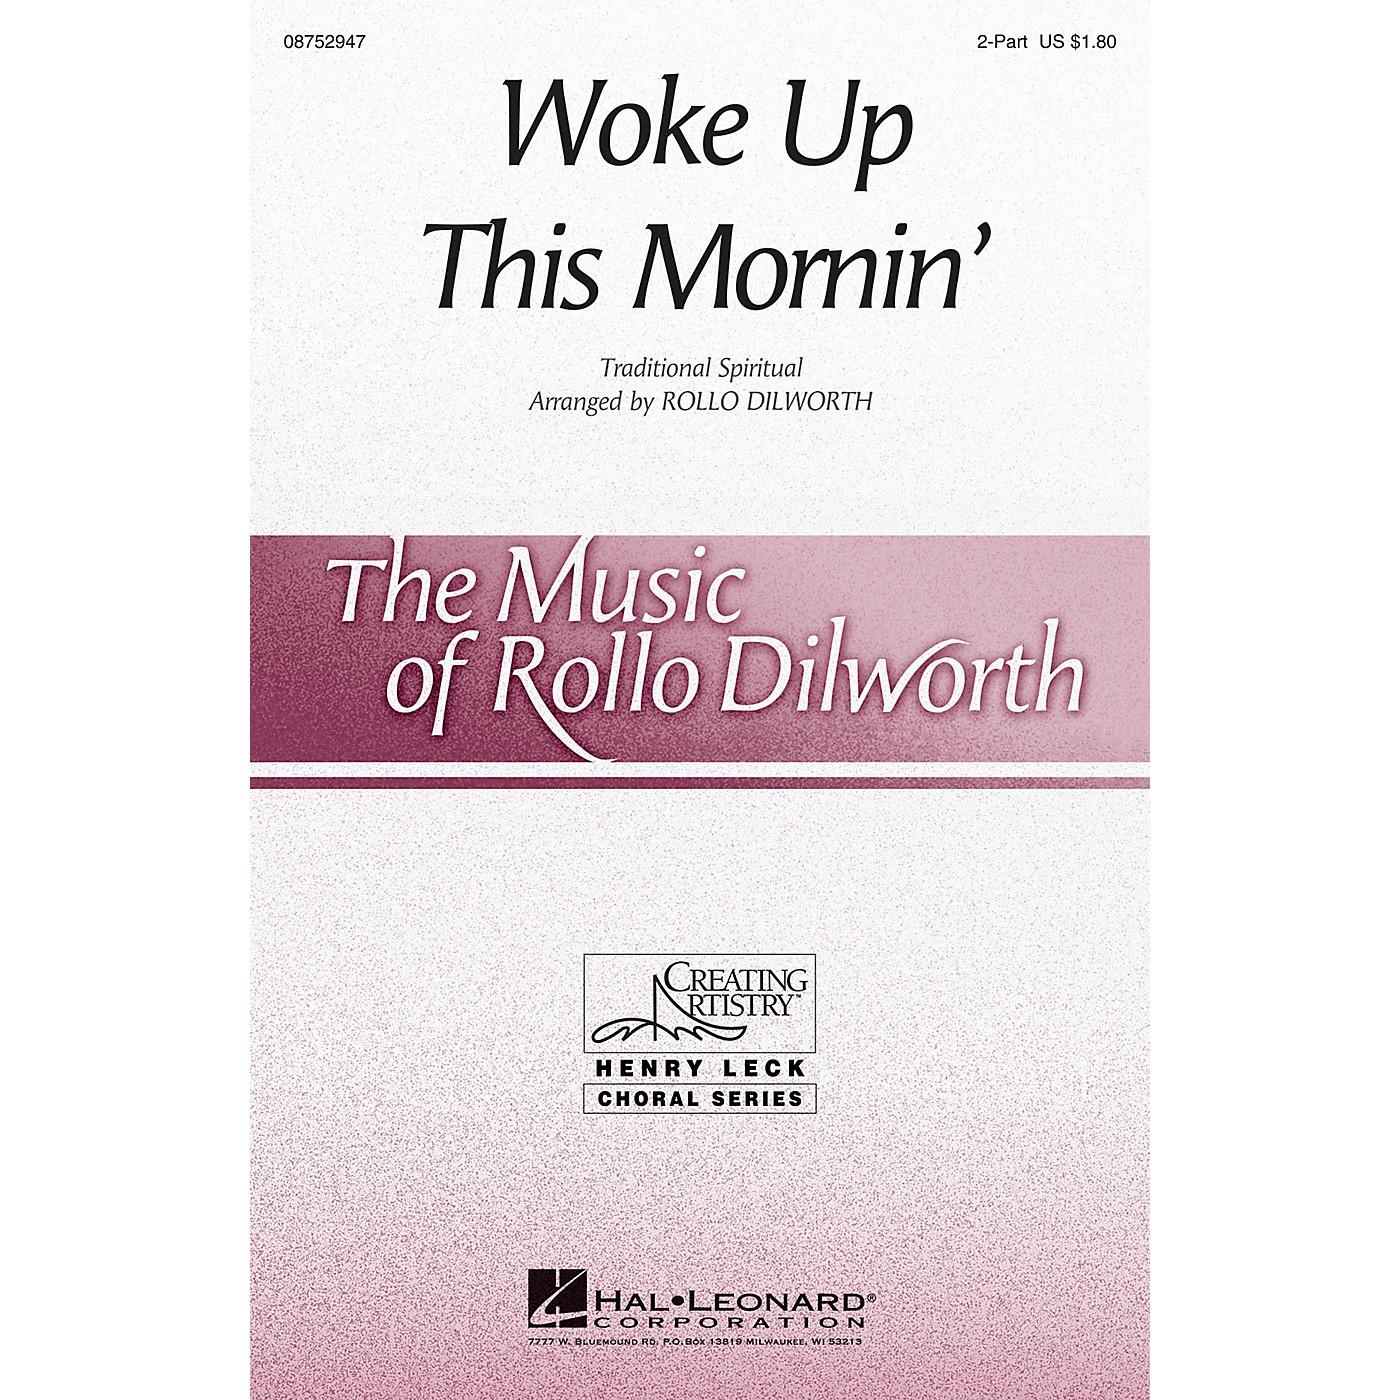 Hal Leonard Woke Up This Mornin' 2-Part arranged by Rollo Dilworth thumbnail